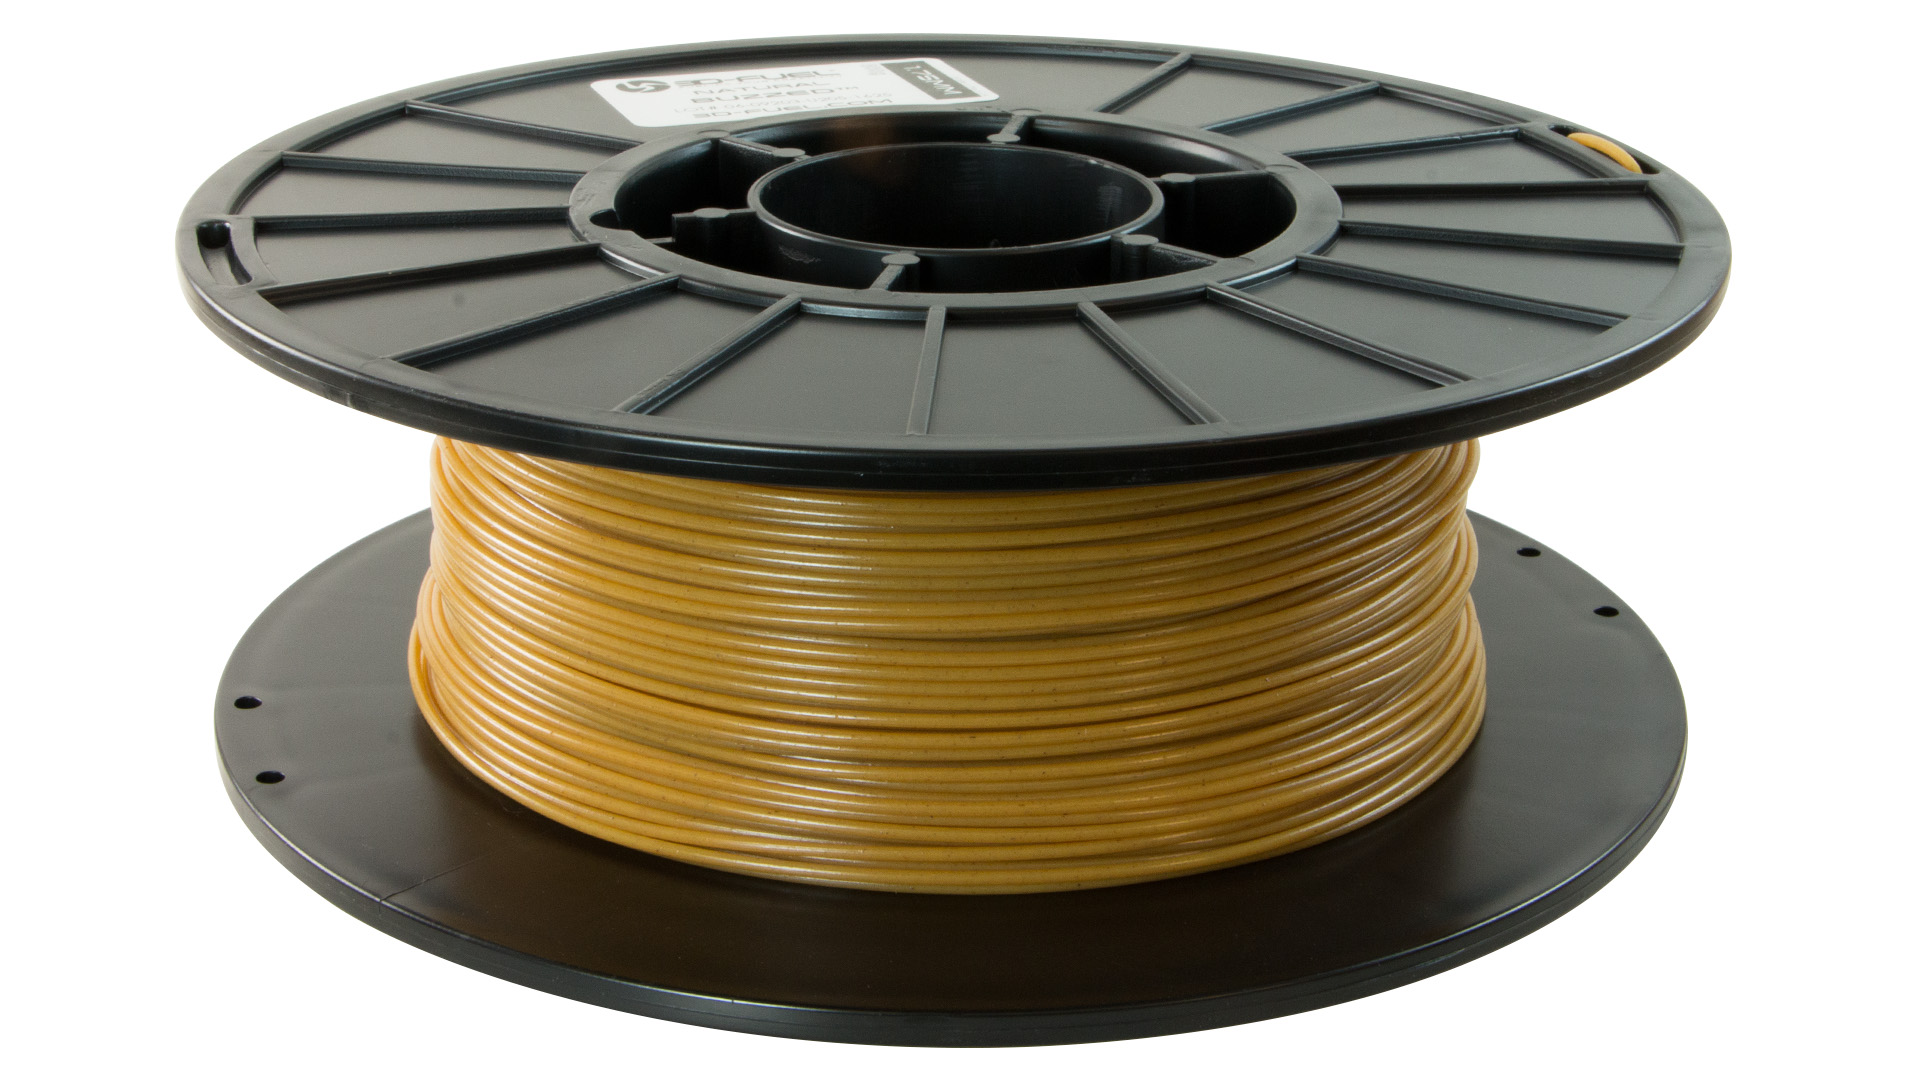 Filament photo